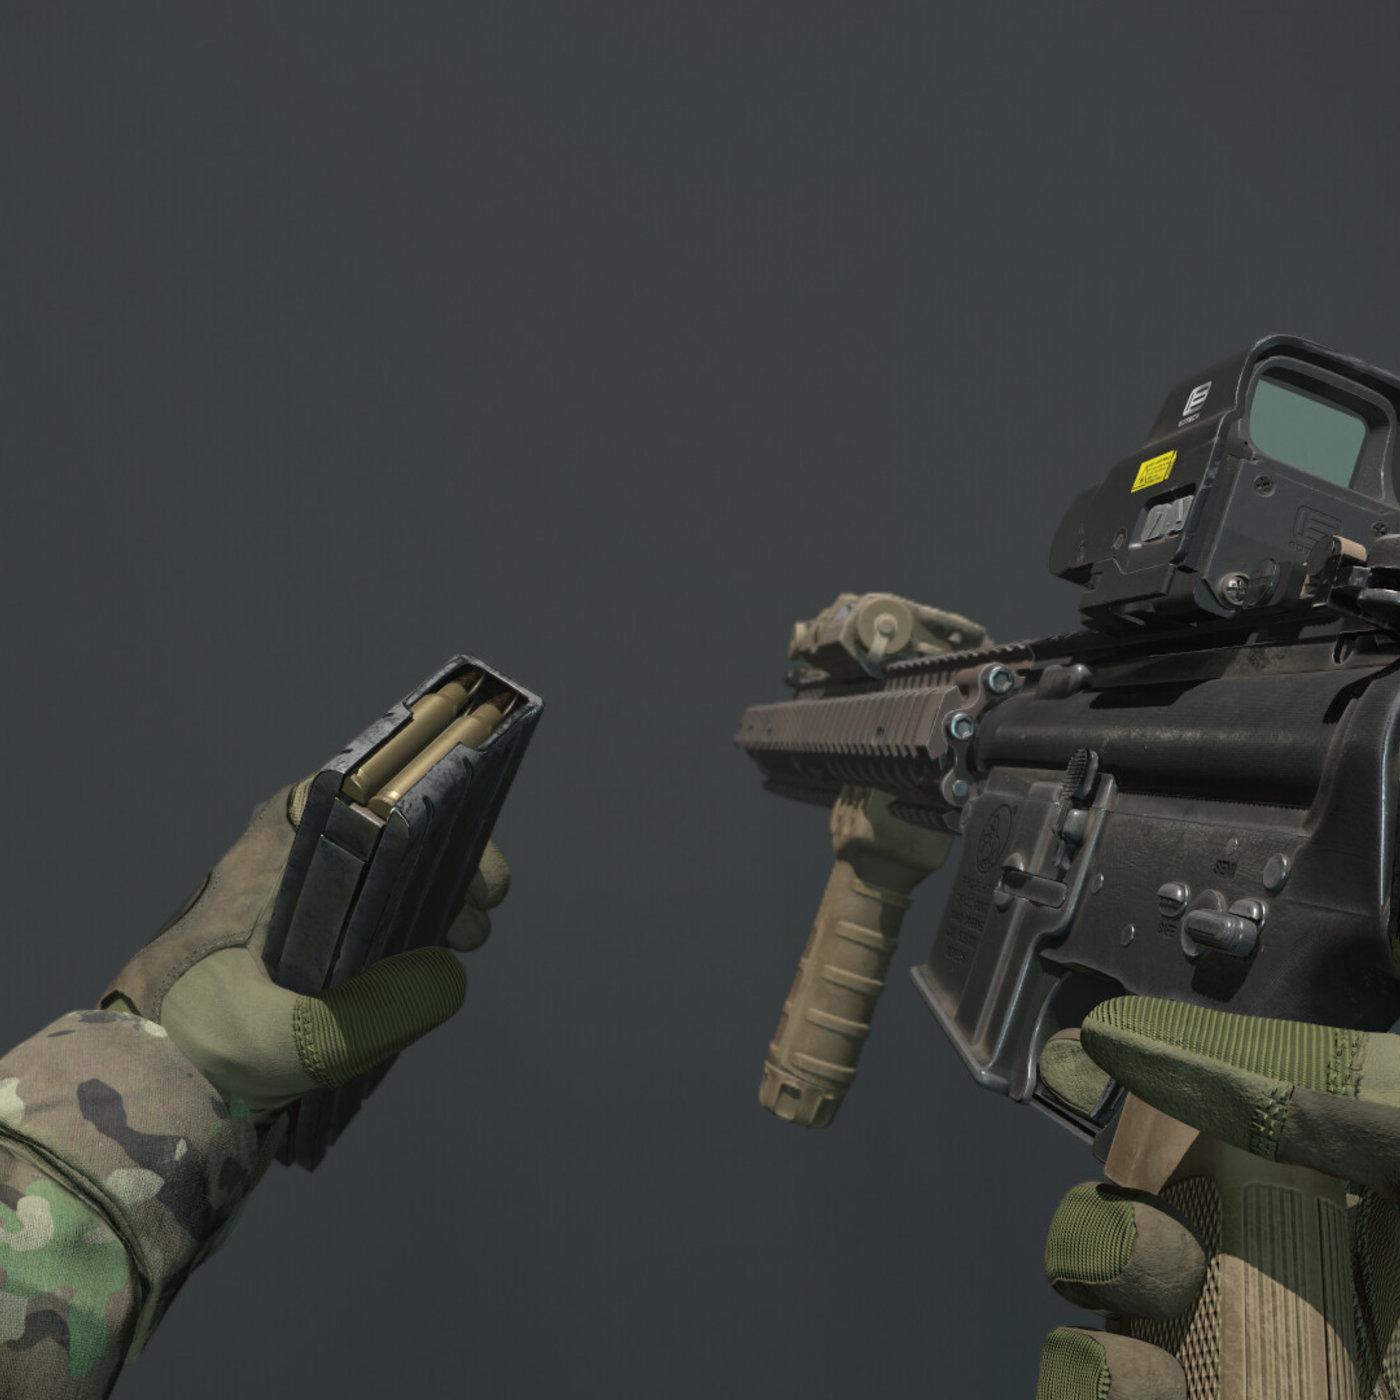 Heavy Assault Rifle and Assault rifle M4A1